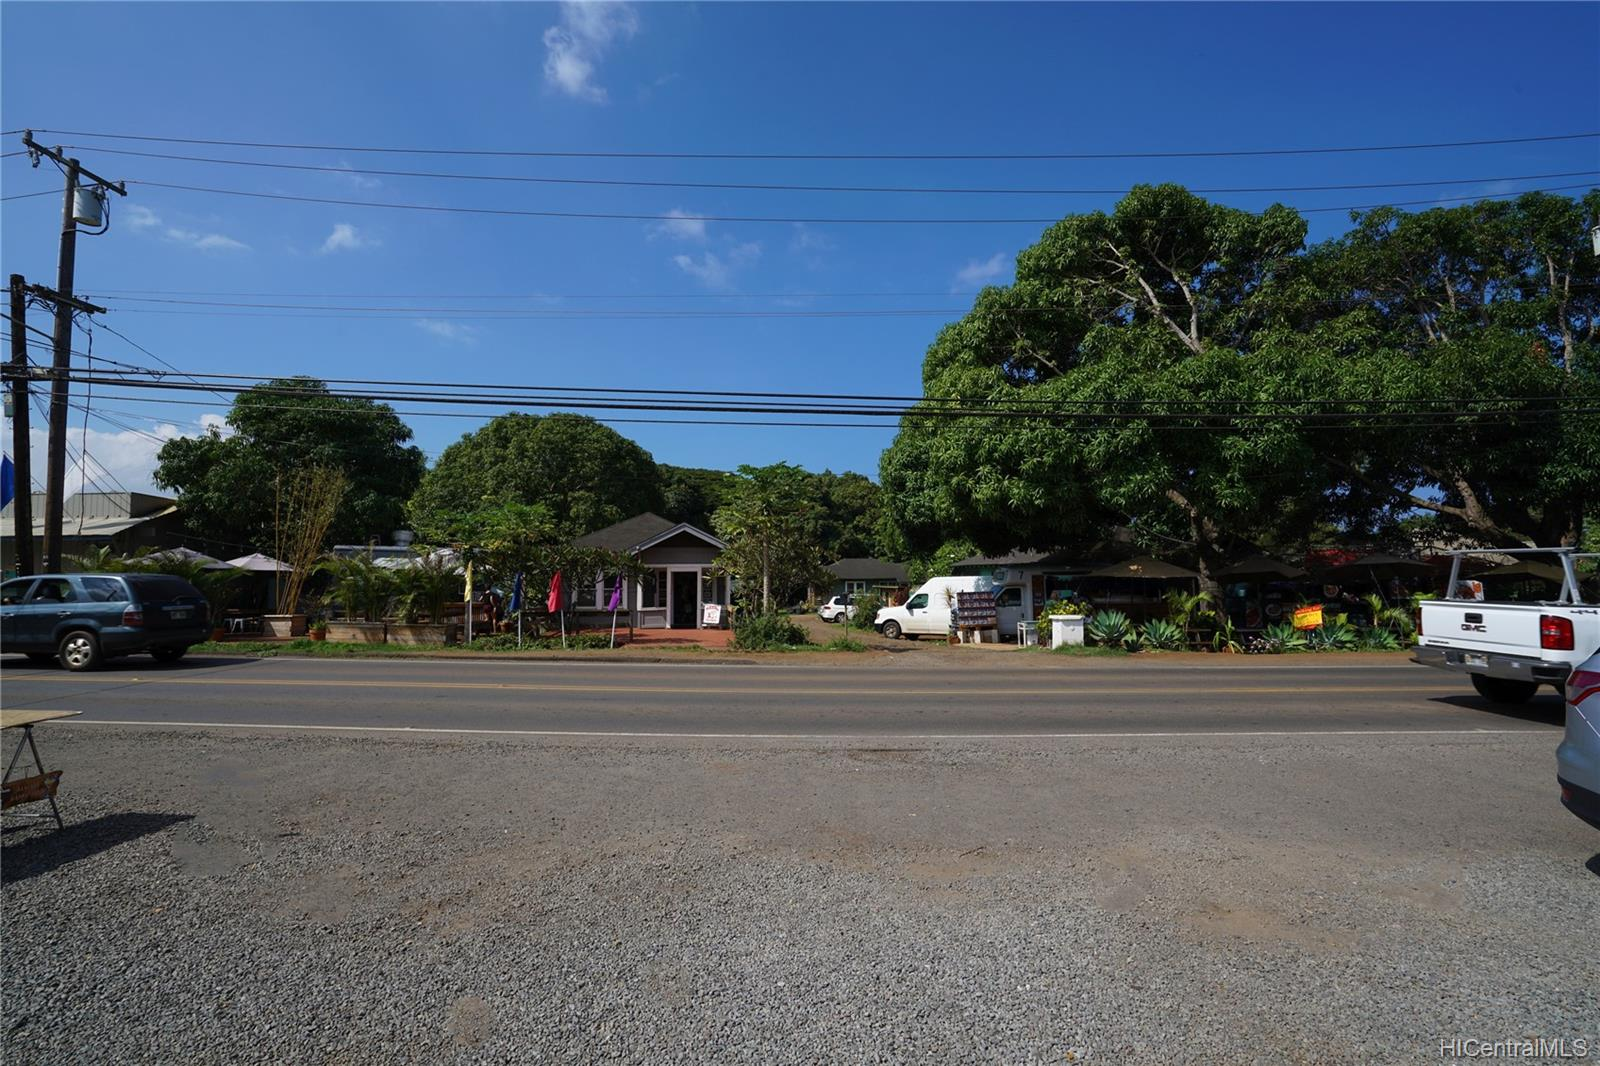 66-239 Kamehameha Hwy Haleiwa Oahu commercial real estate photo7 of 7